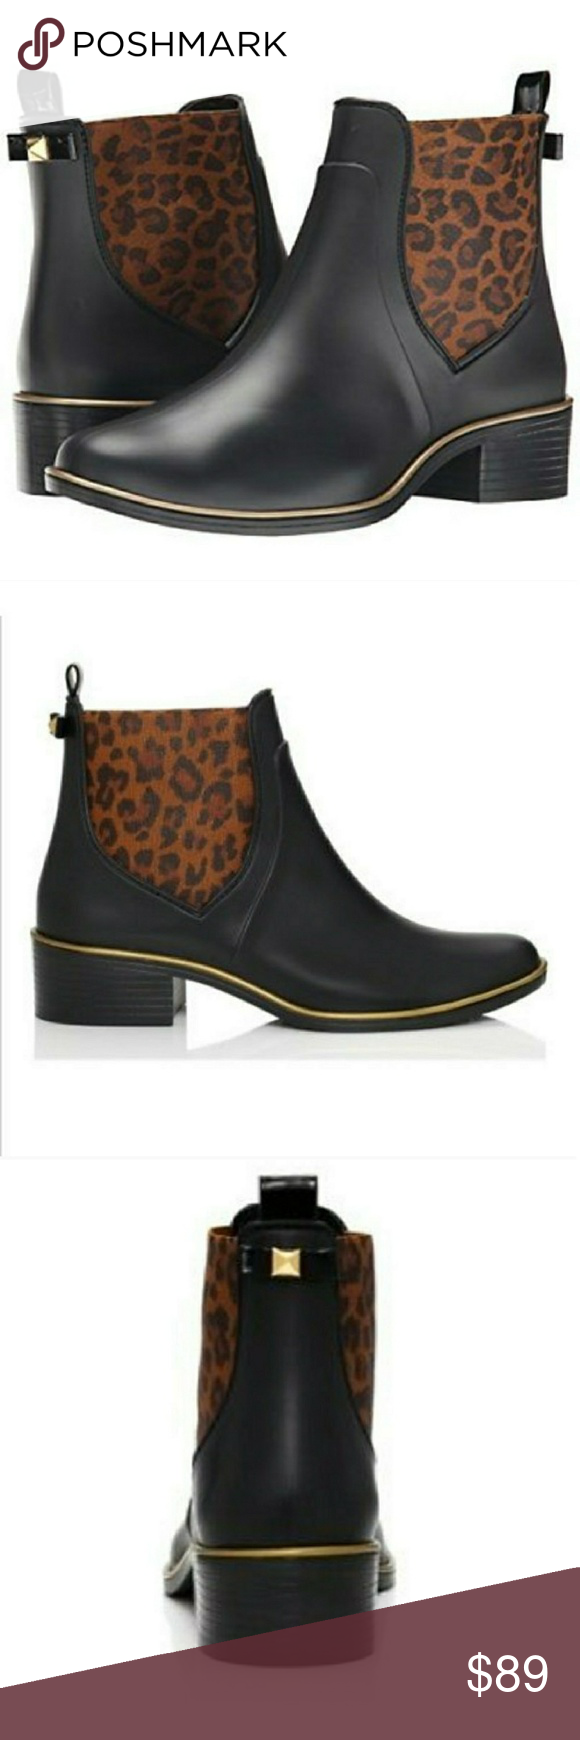 Kate Spade Domina Rain Booties Rain Boot Rain And Leopards